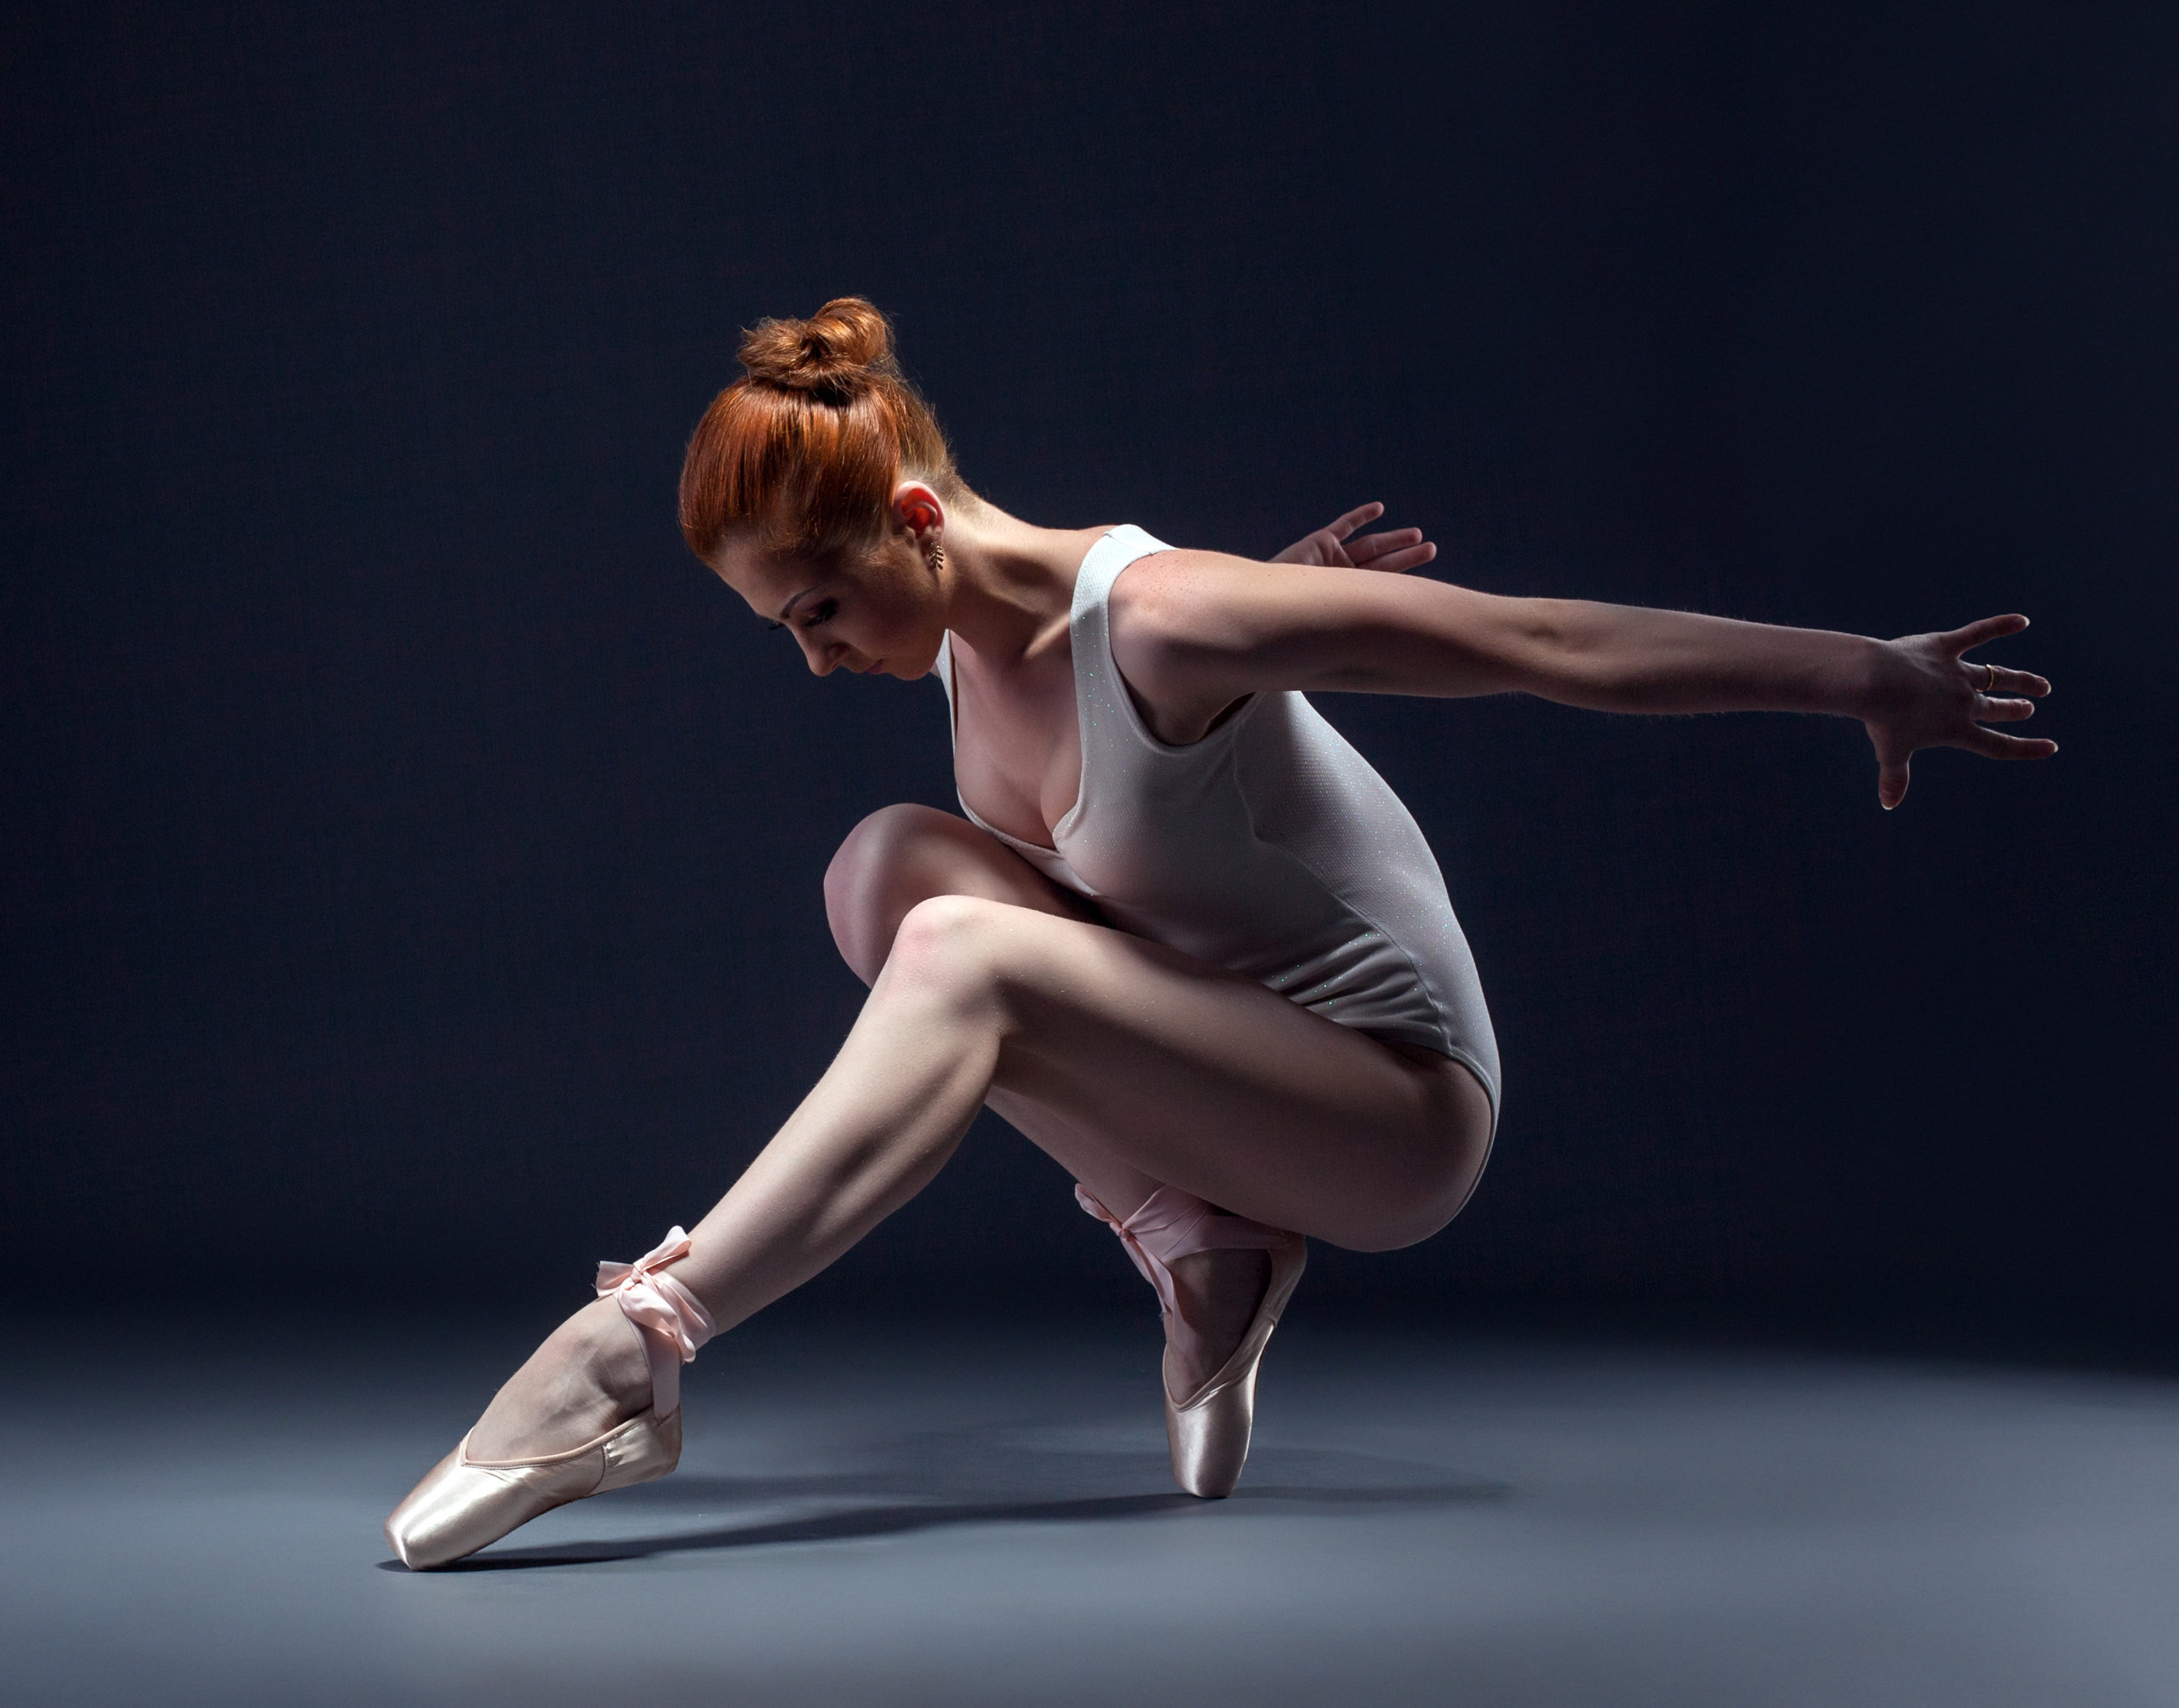 Graceful slender ballerina dancing in studio, close-up